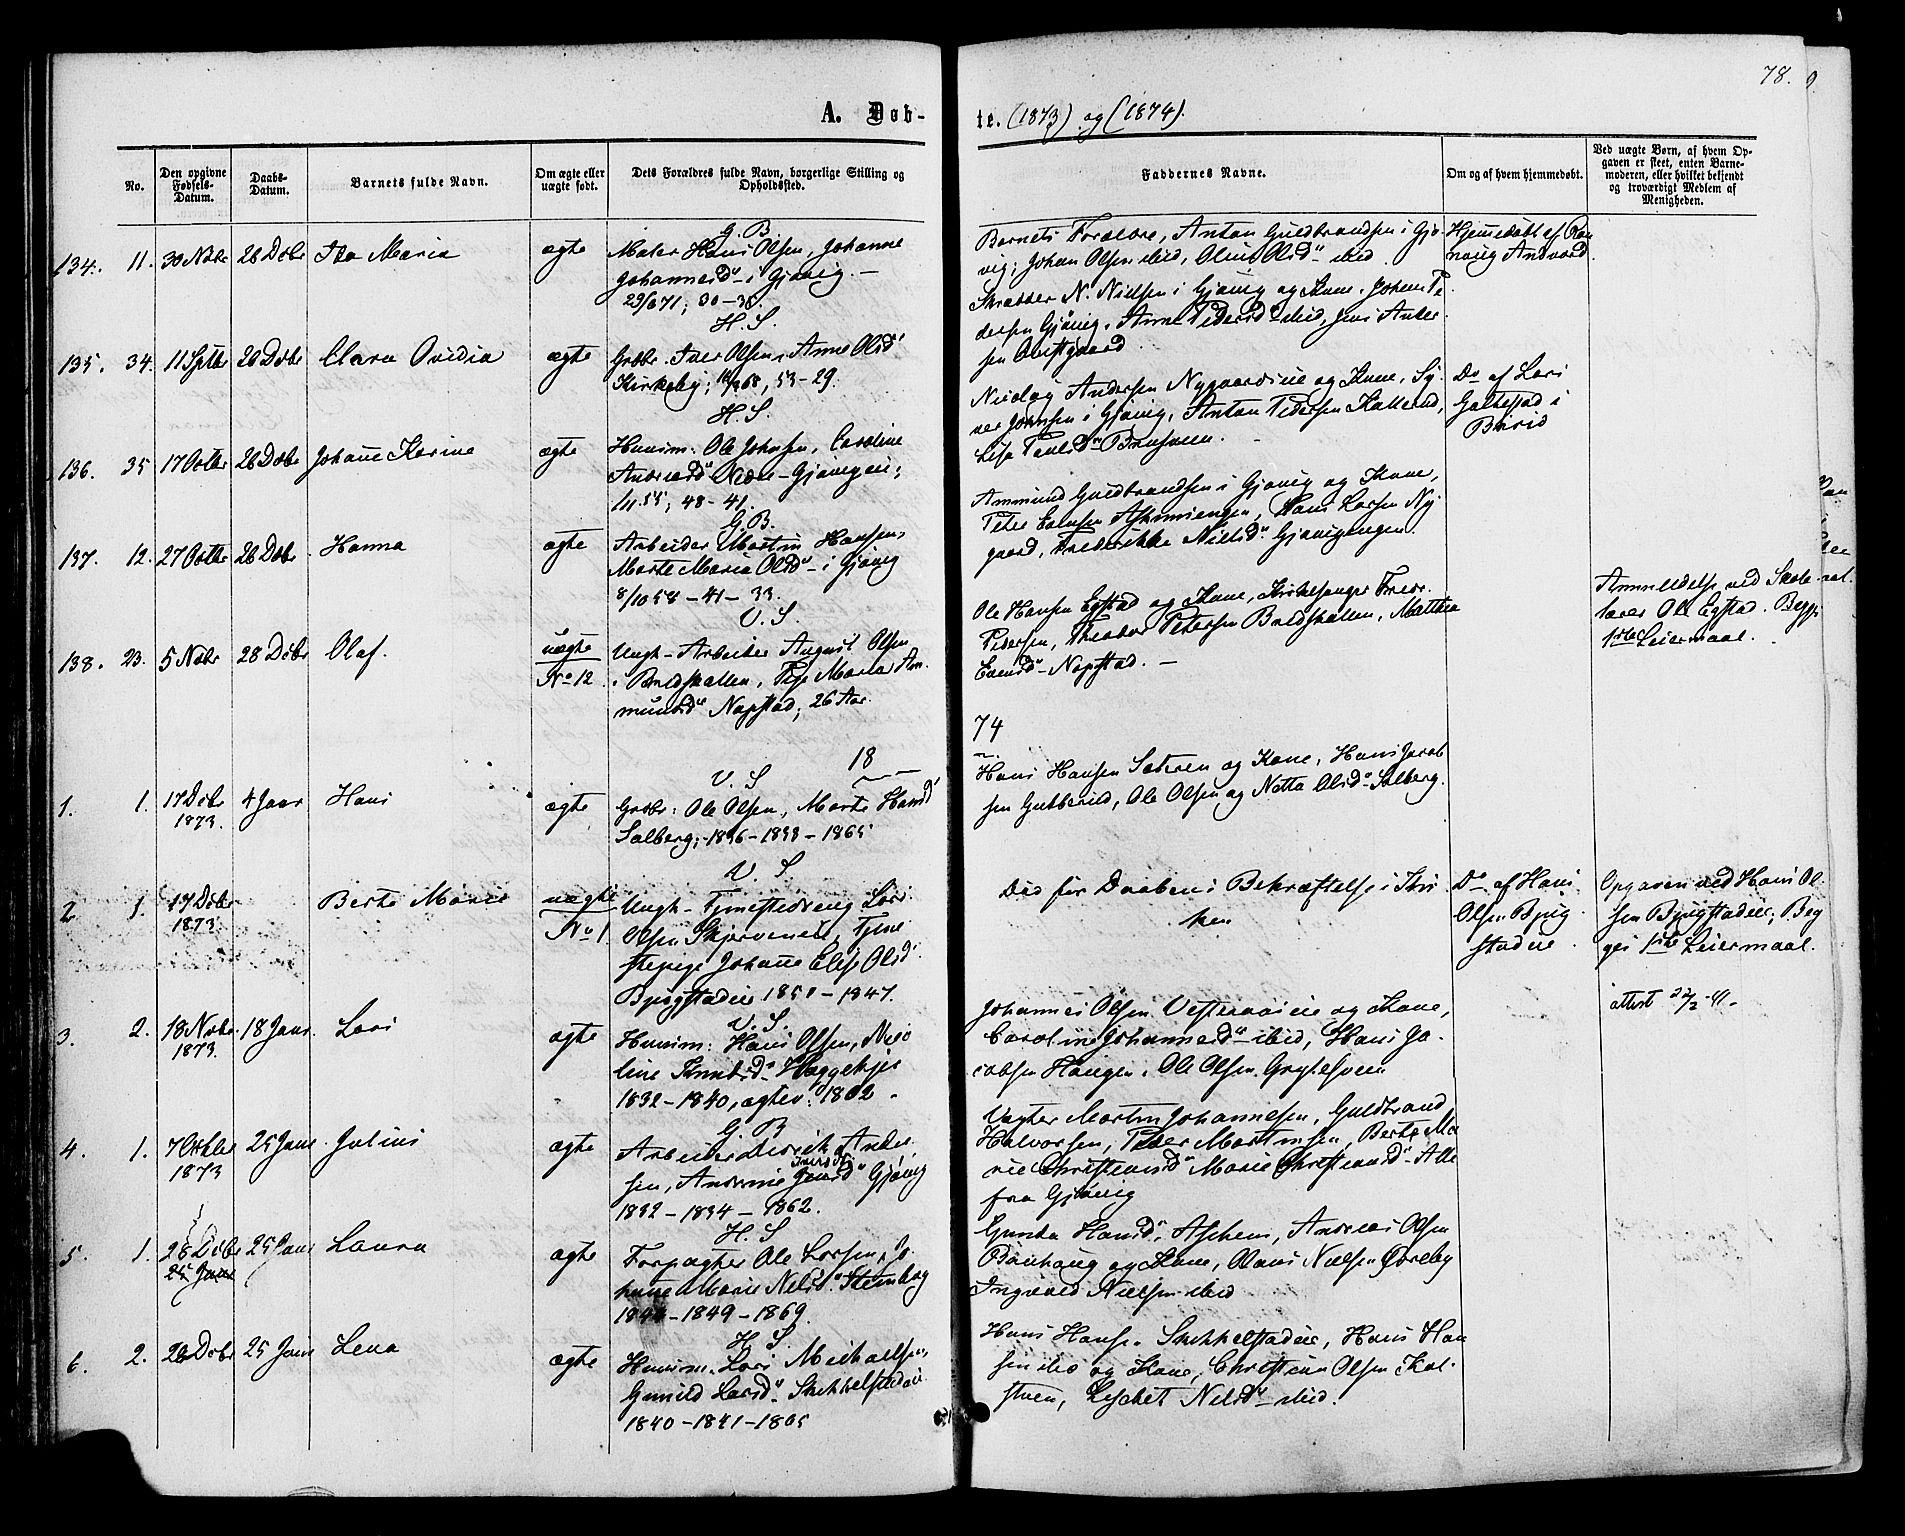 SAH, Vardal prestekontor, H/Ha/Haa/L0007: Ministerialbok nr. 7, 1867-1878, s. 78